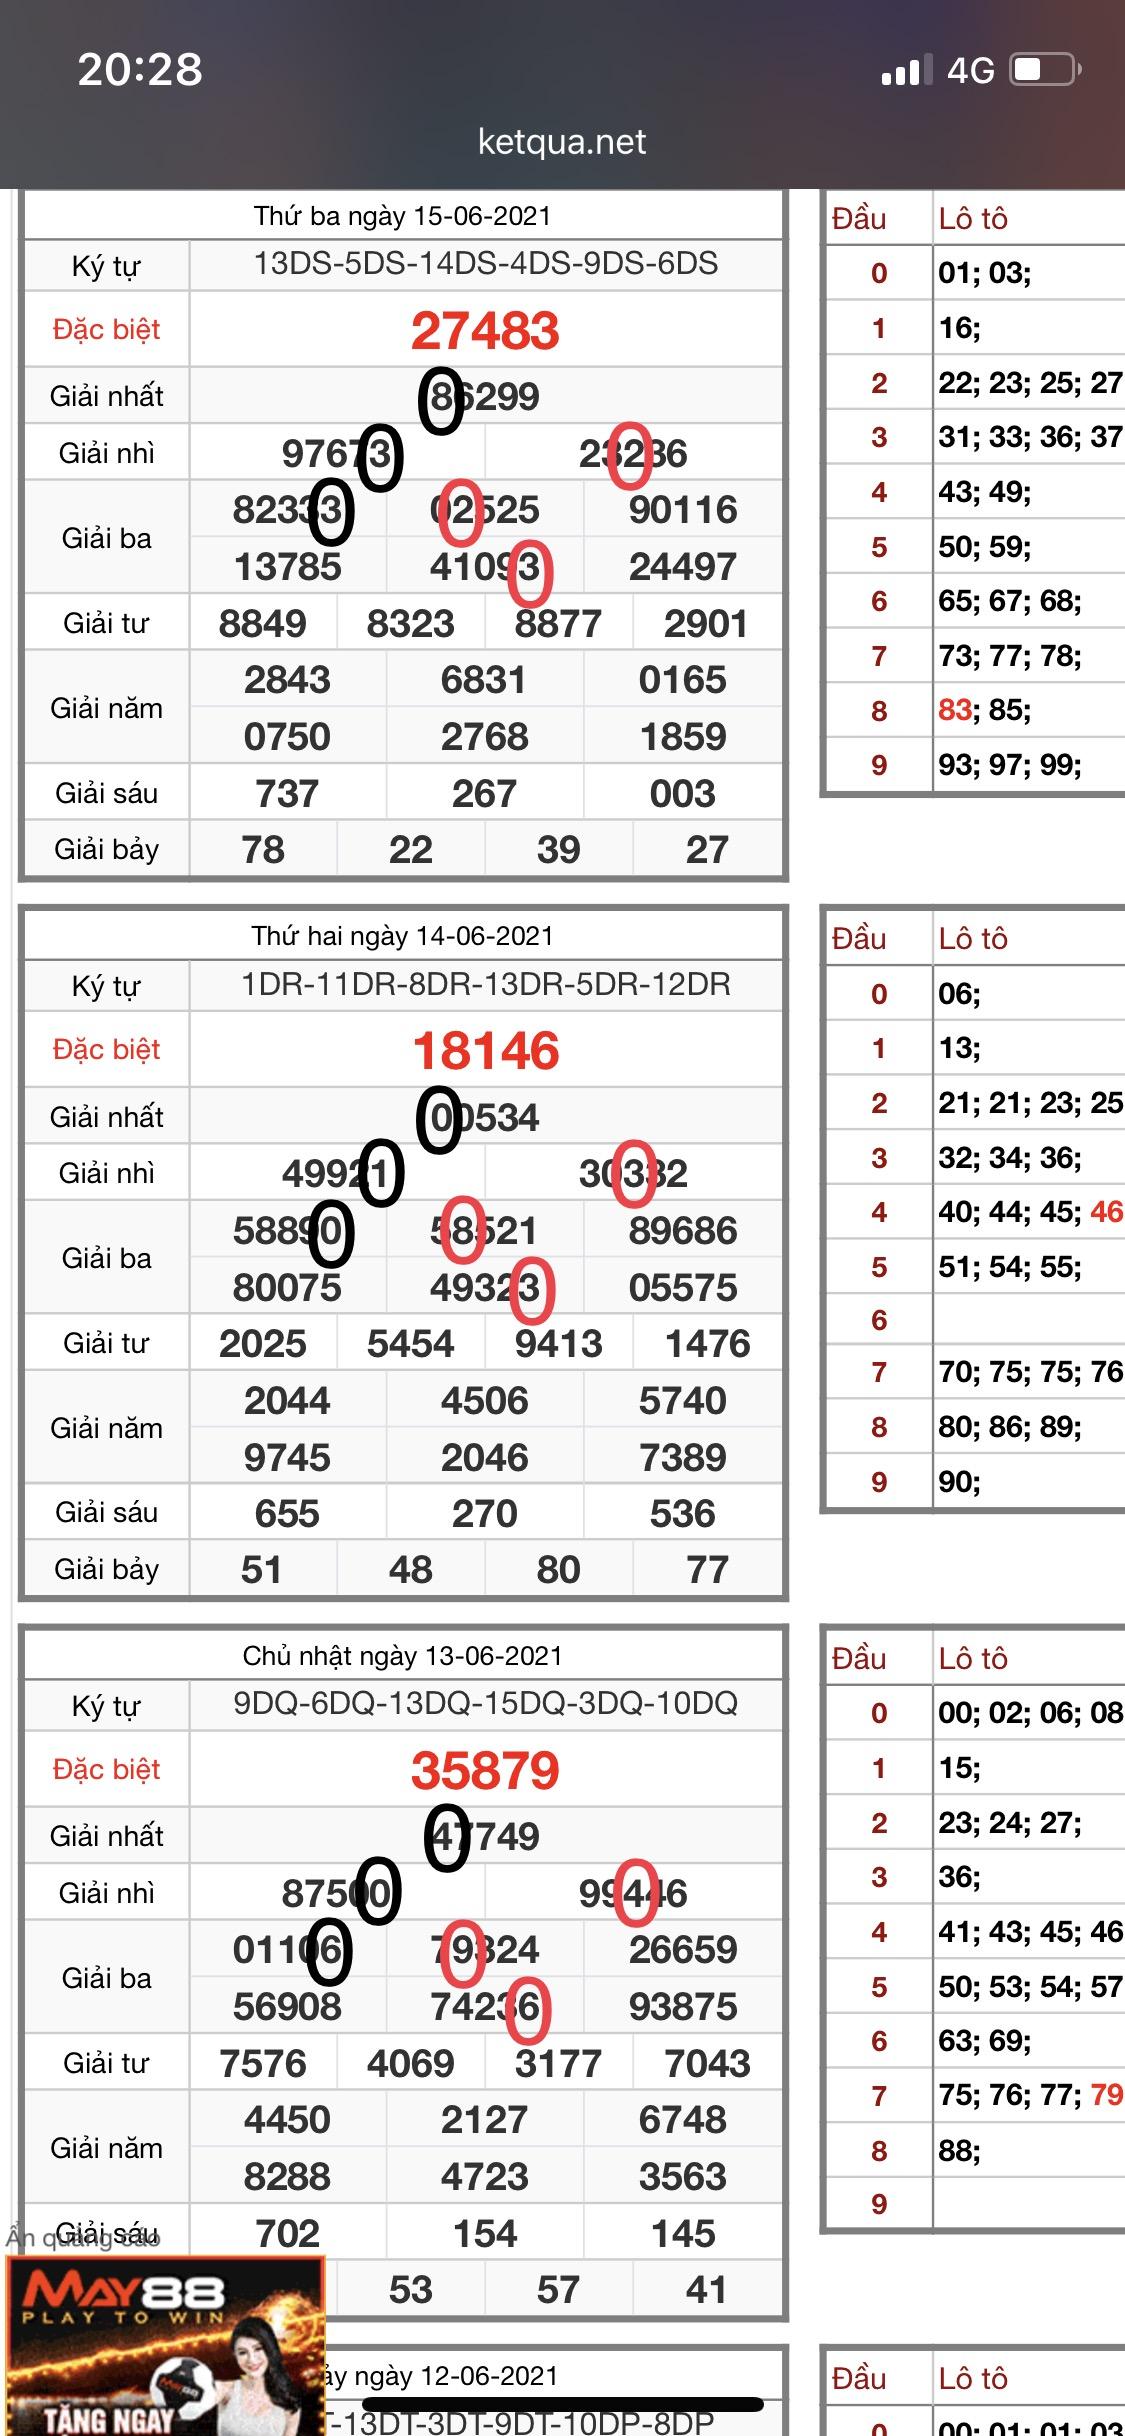 DAD4A565-294D-4DA5-8536-1E3BEF333224.jpeg